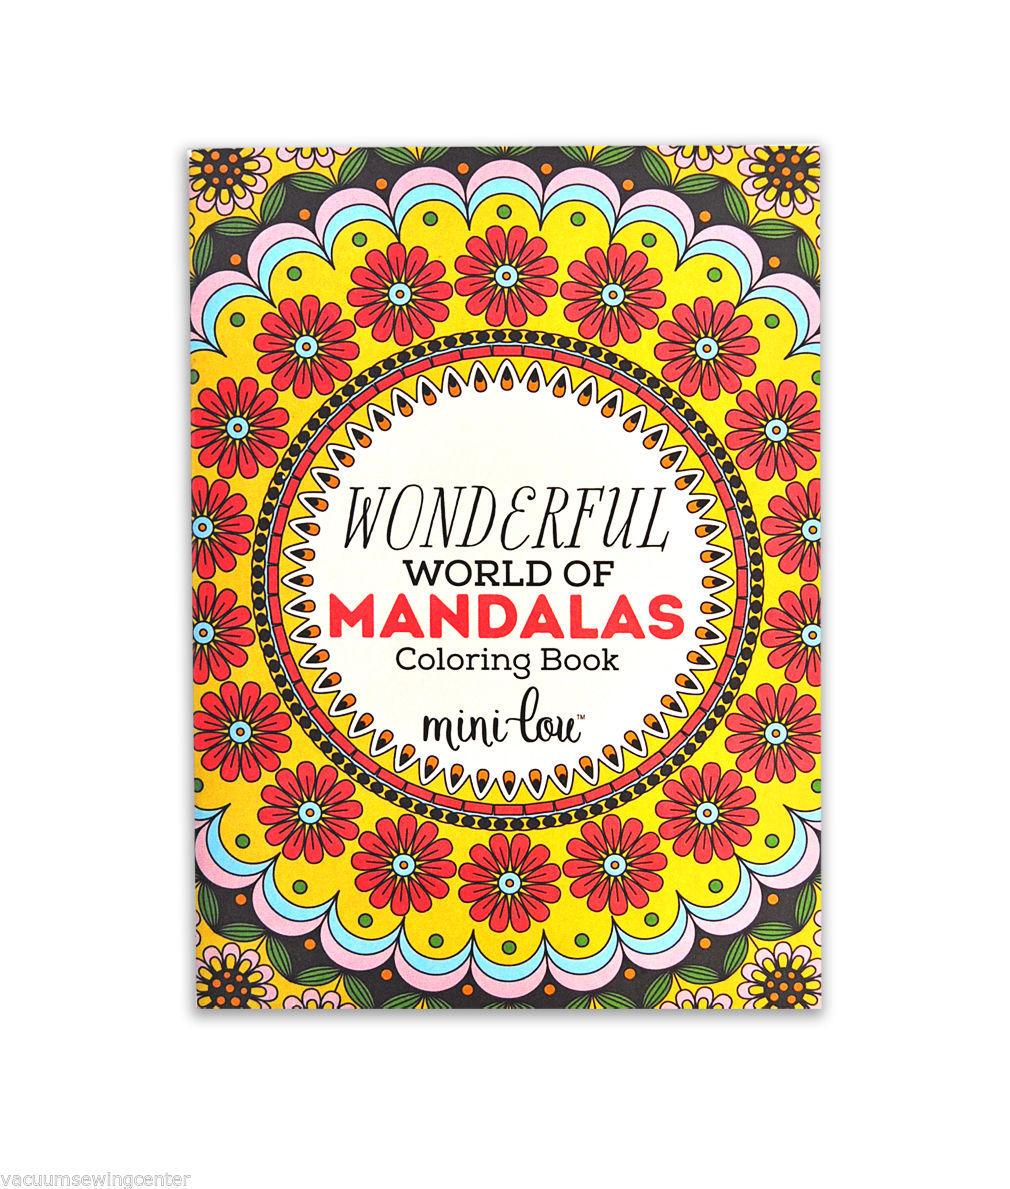 The Wonderful World of Mandalas Coloring Book - $6.25